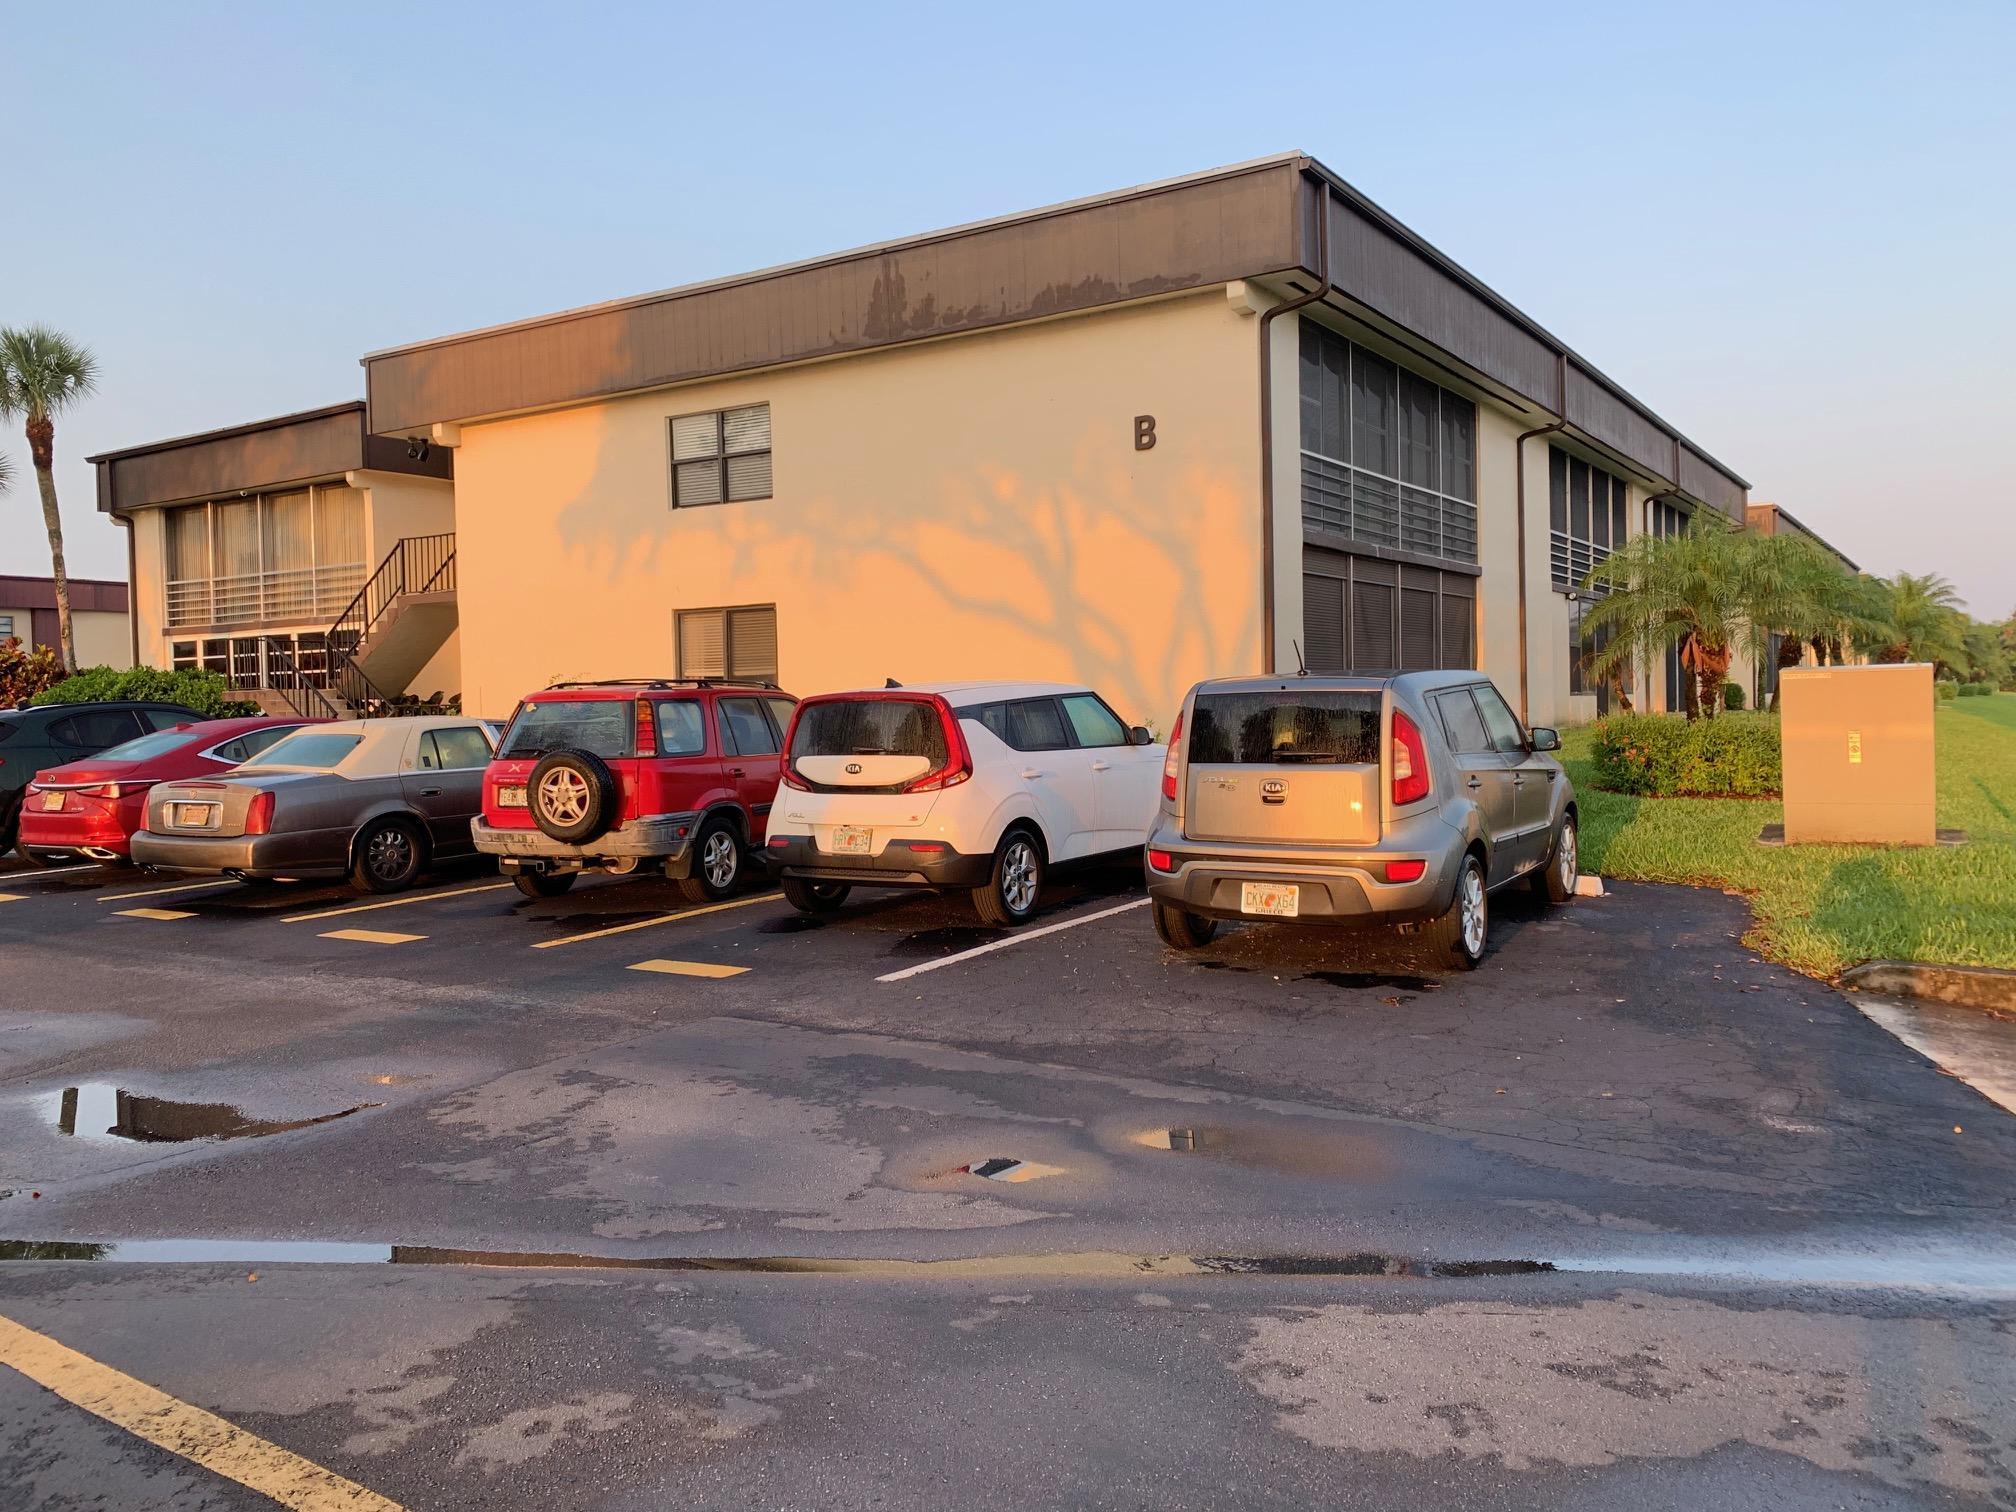 58 Capri B, Delray Beach, Florida 33484, 2 Bedrooms Bedrooms, ,2 BathroomsBathrooms,F,Condominium,Capri B,RX-10617150